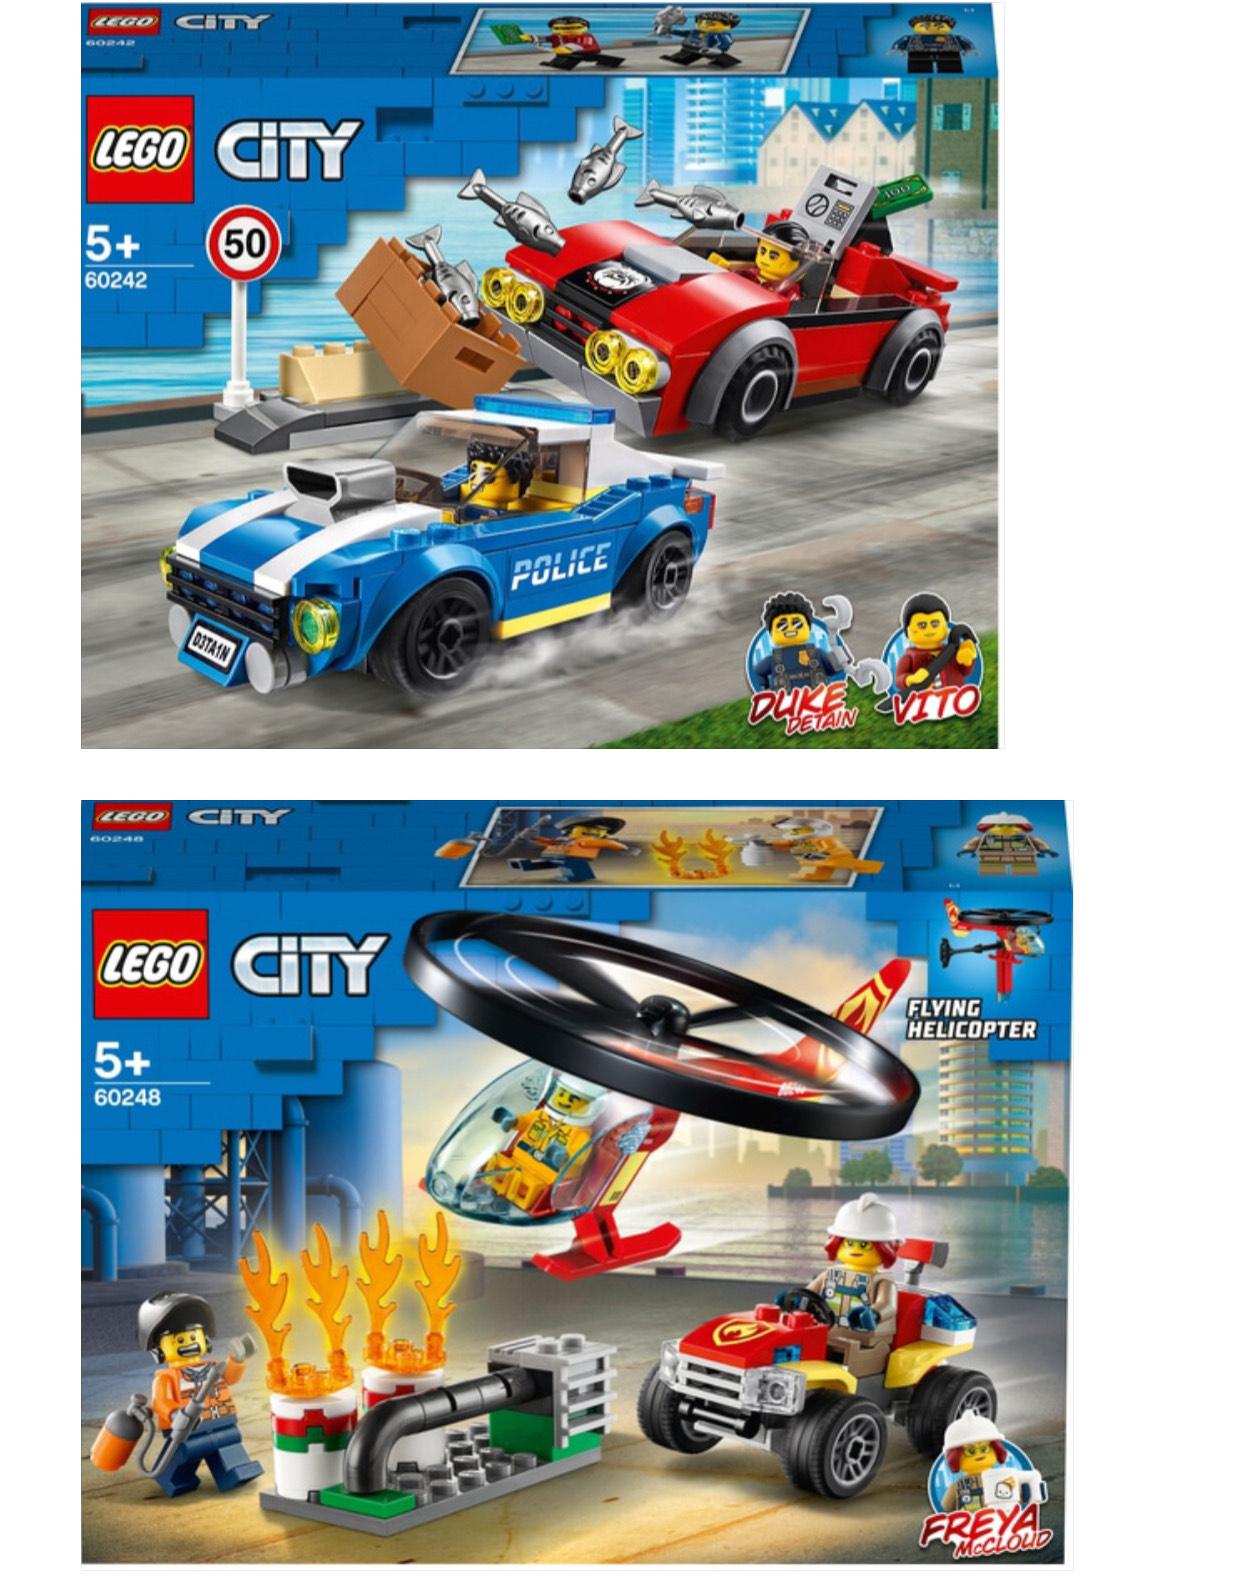 LEGO 60242 City Police Highway & LEGO 60248 City Fire Helicopter with ATV Quad Set £12 each @ Tesco (Peterborough)